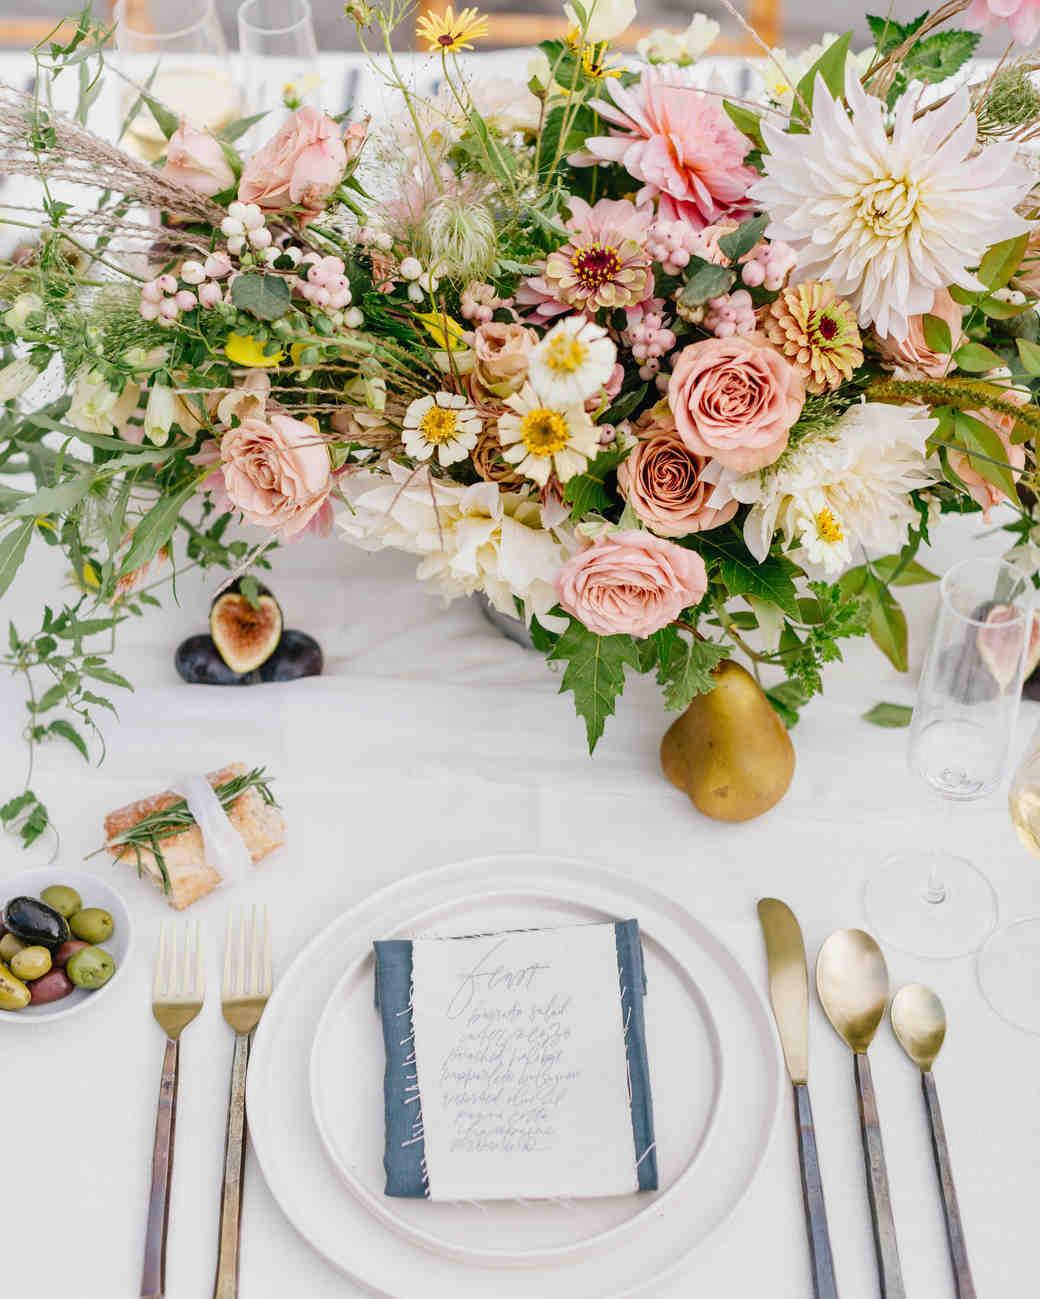 dahlia wedding centerpieces big decor table setting